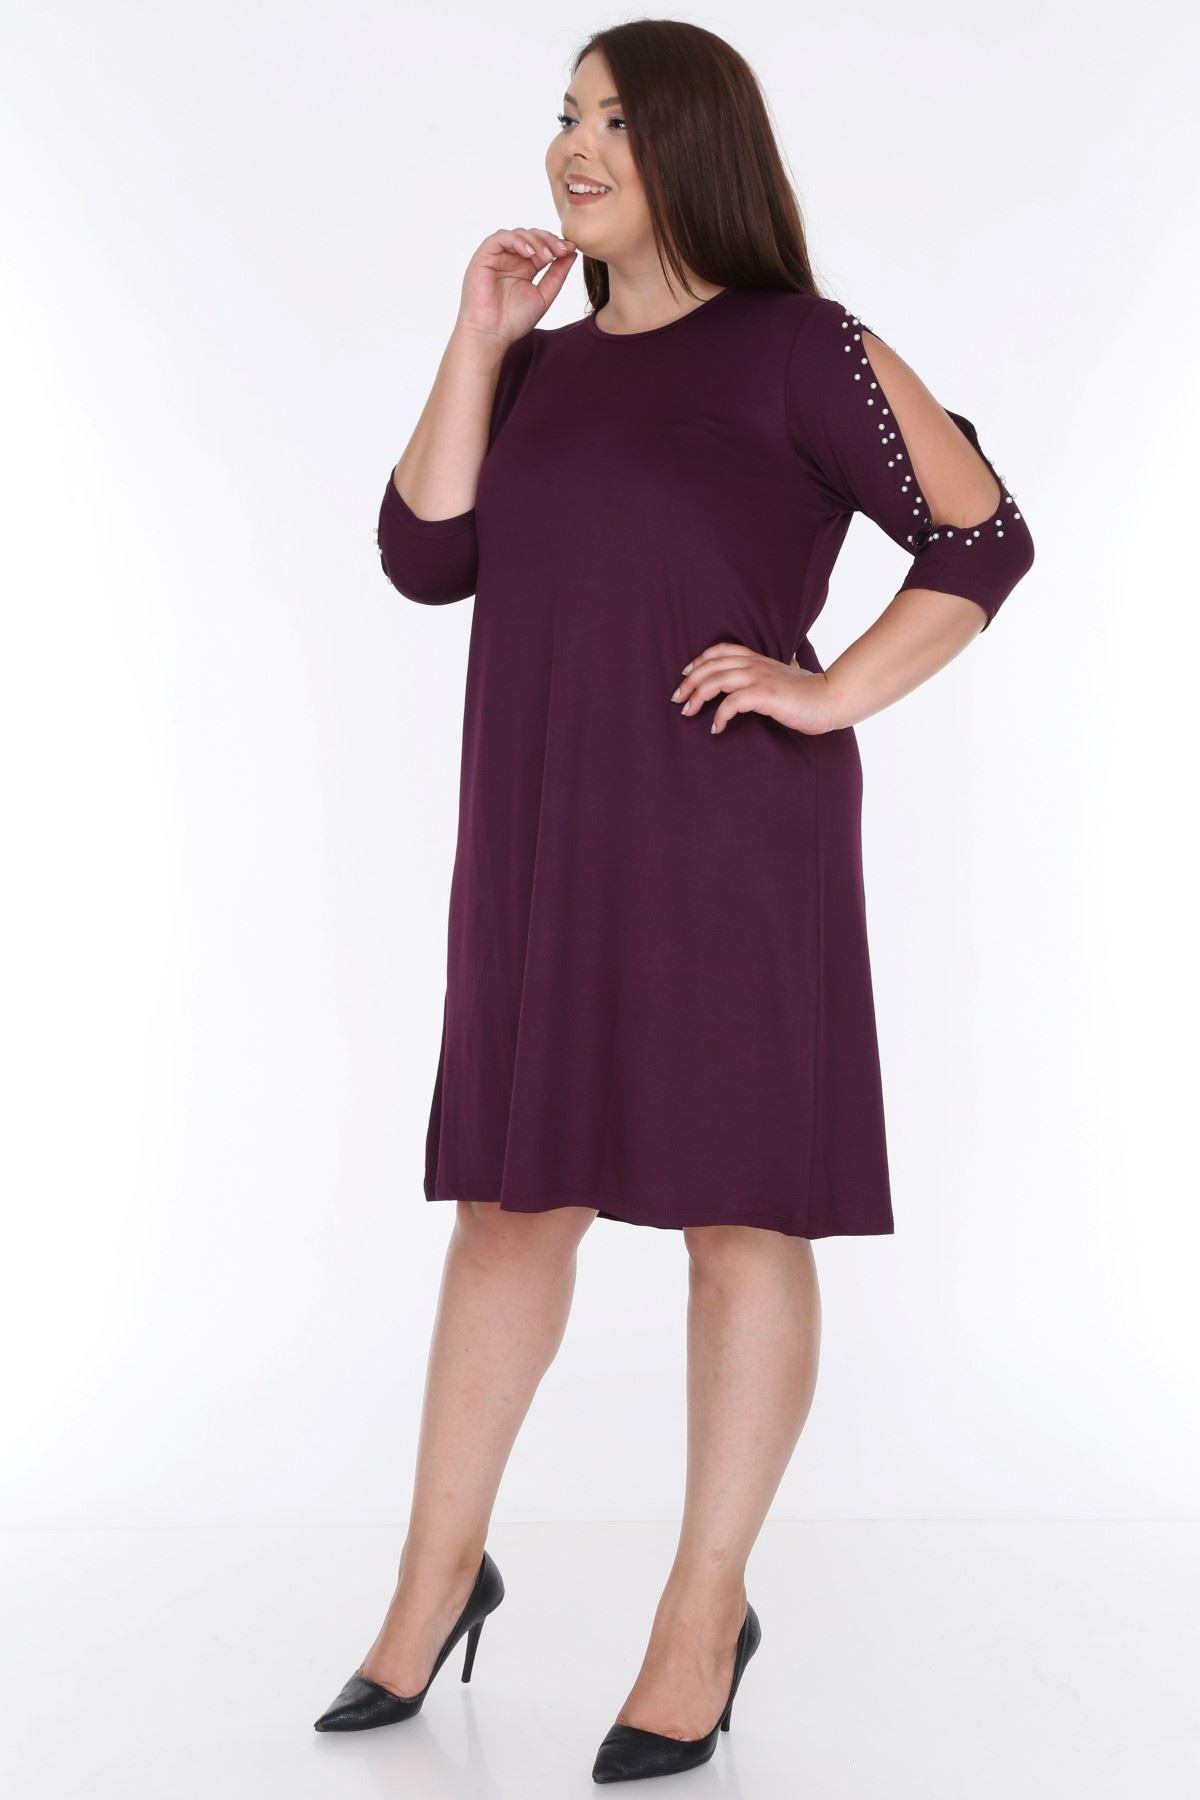 Kol İncili Mor Büyük Beden Elbise 9E-0615